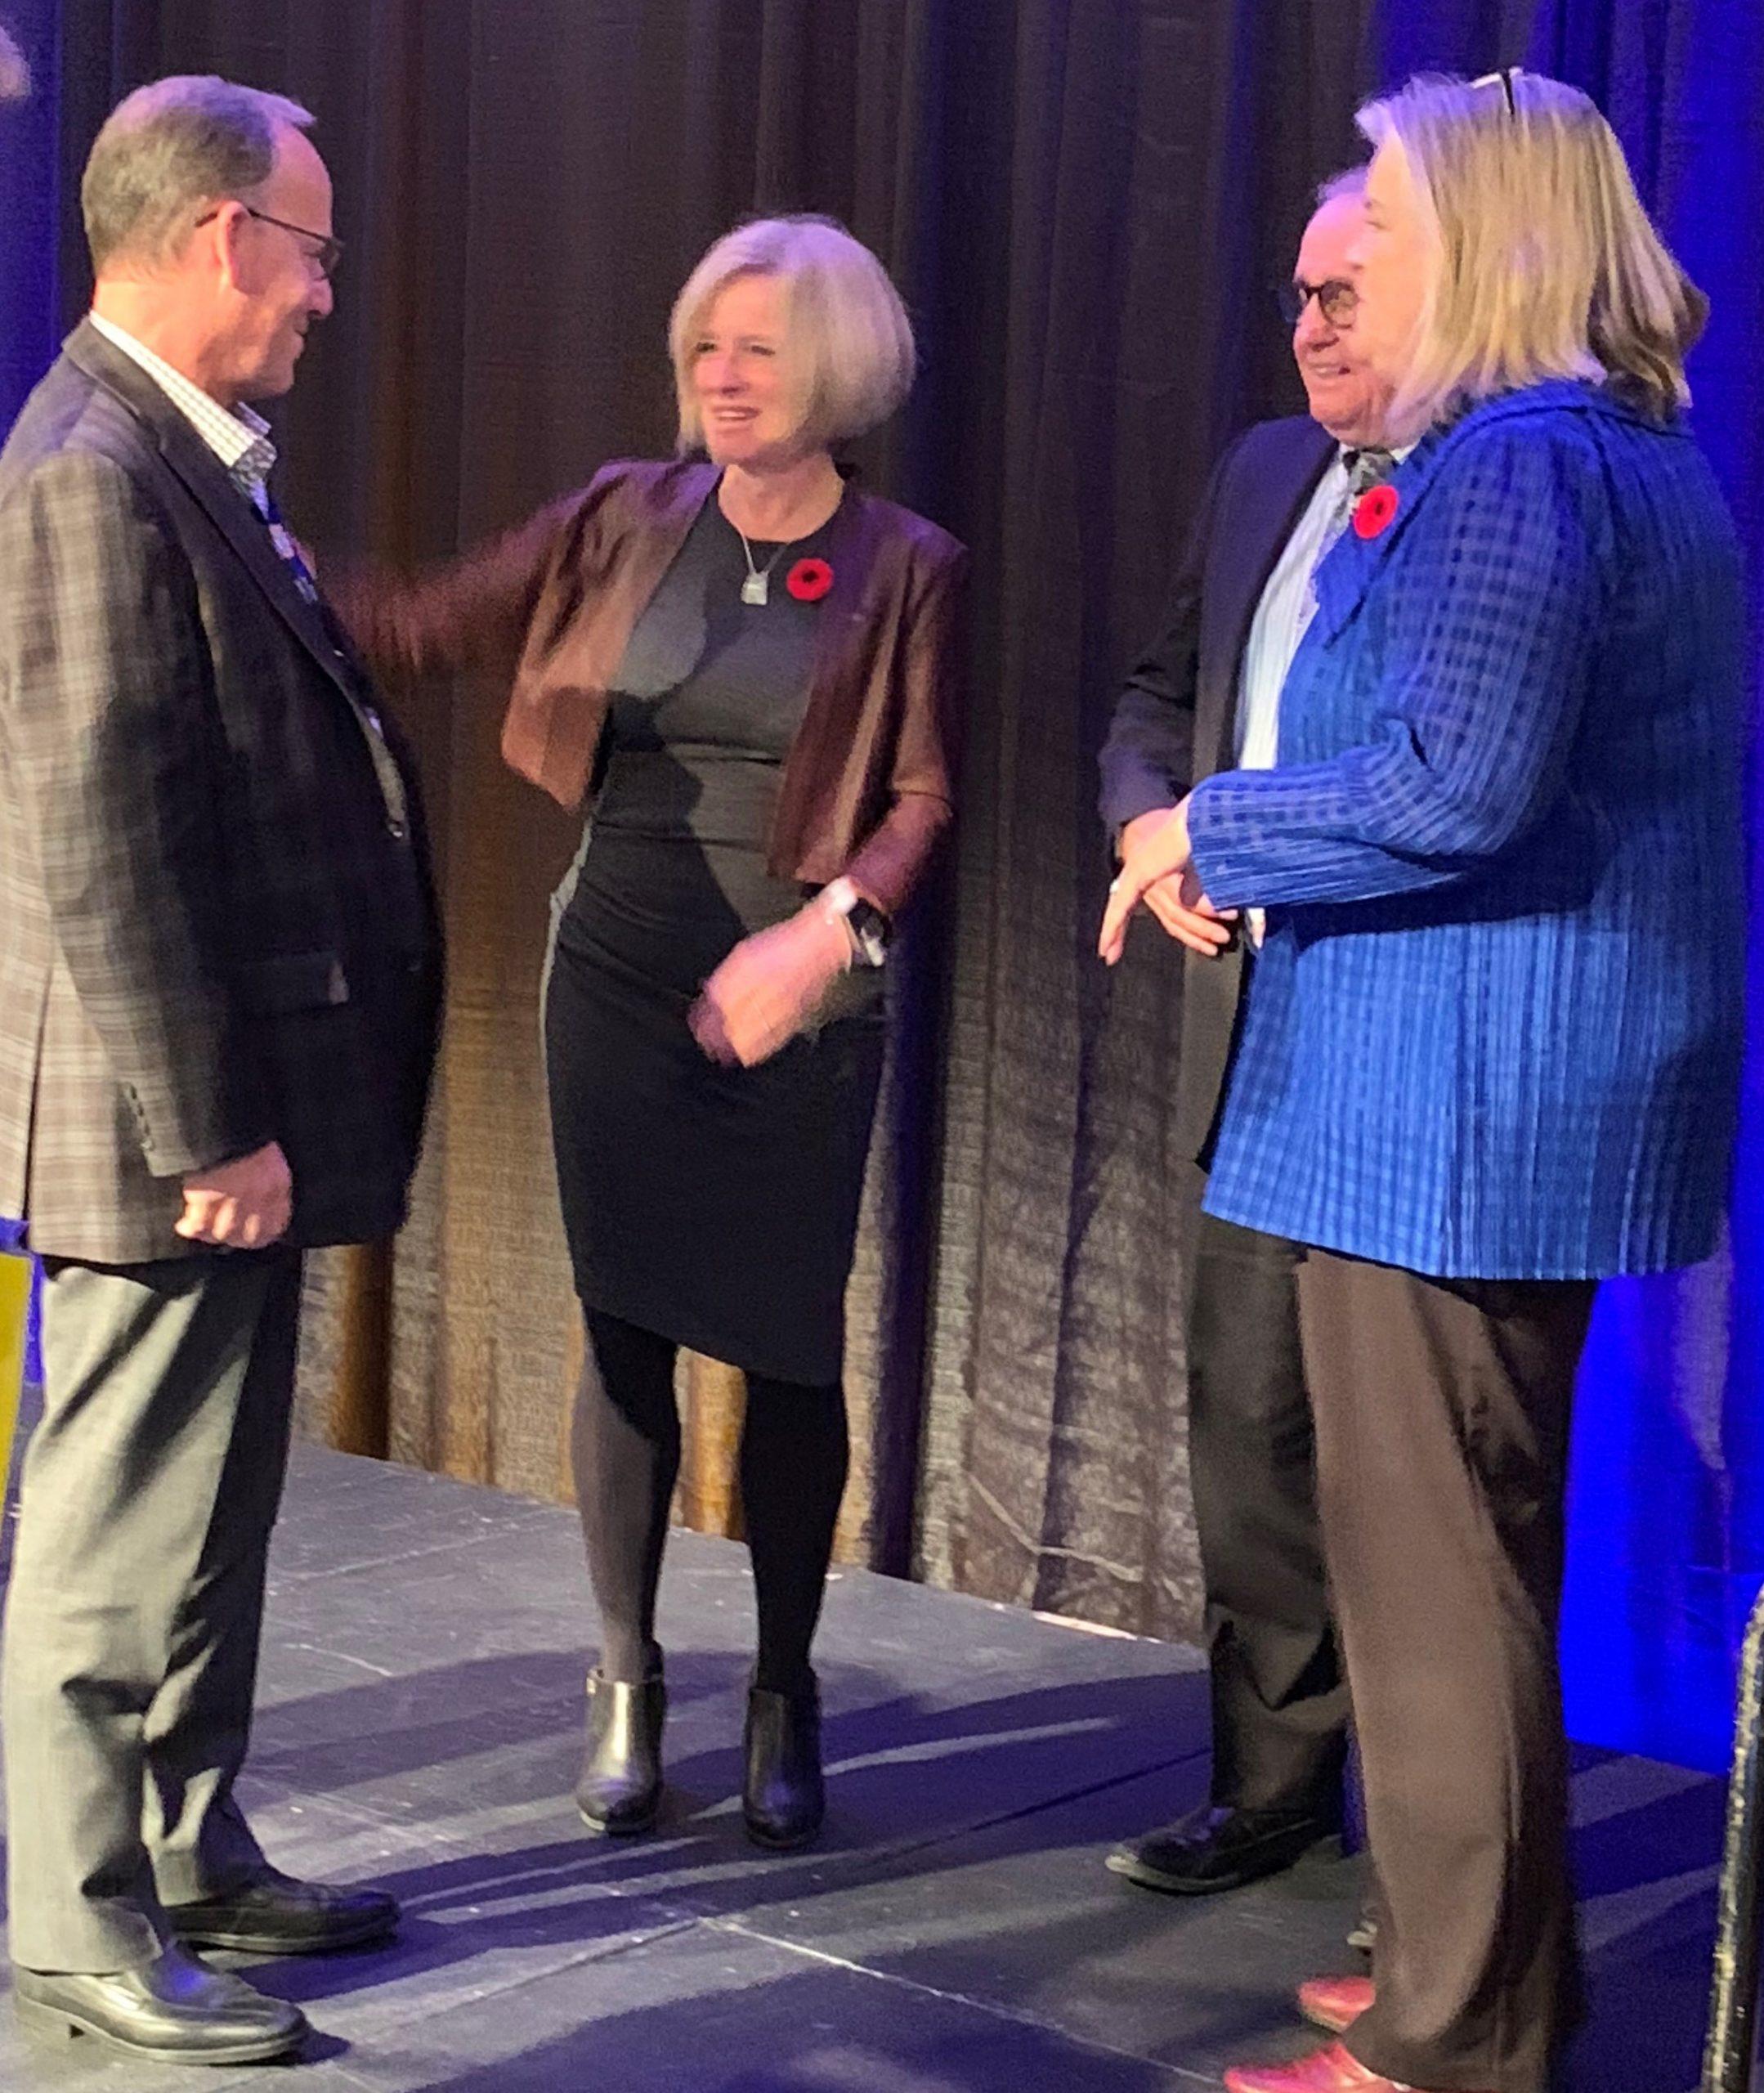 Alberta Premier Rachel Notley pitches Trans Mountain pipeline in Kamloops